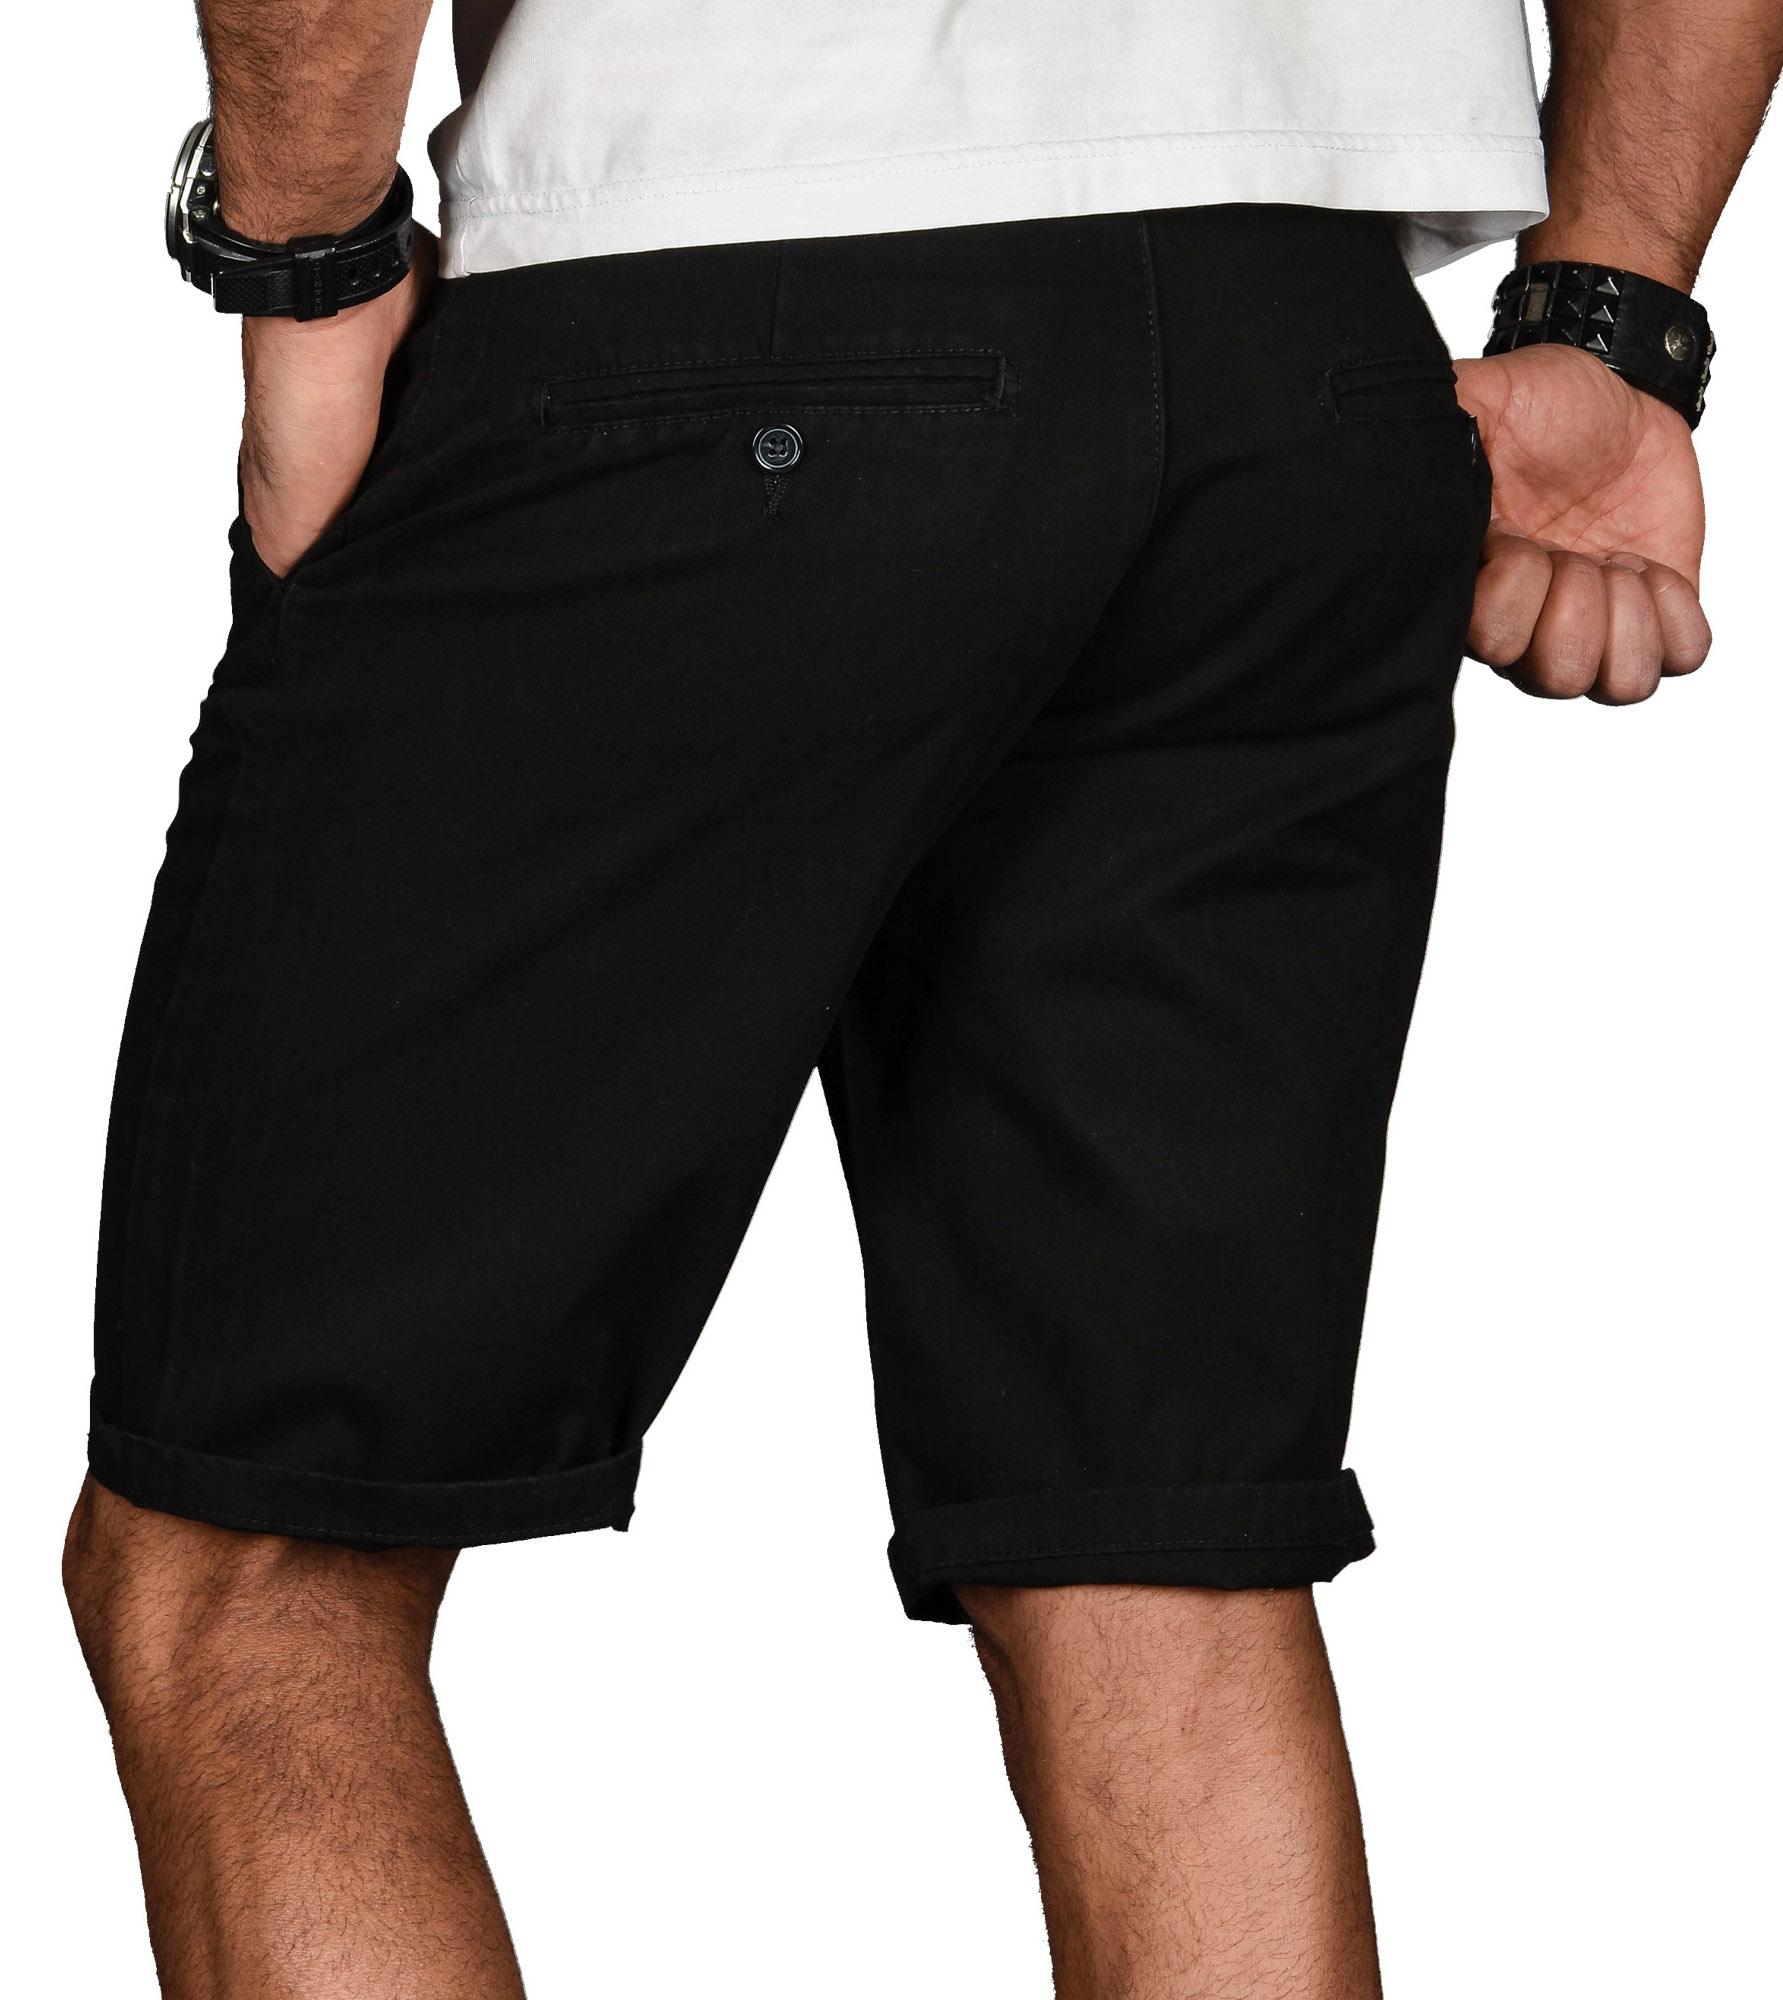 A-Salvarini-Herren-Shorts-kurze-Sommer-Hose-mit-Guertel-Short-Bermuda-NEU-AS096 Indexbild 6